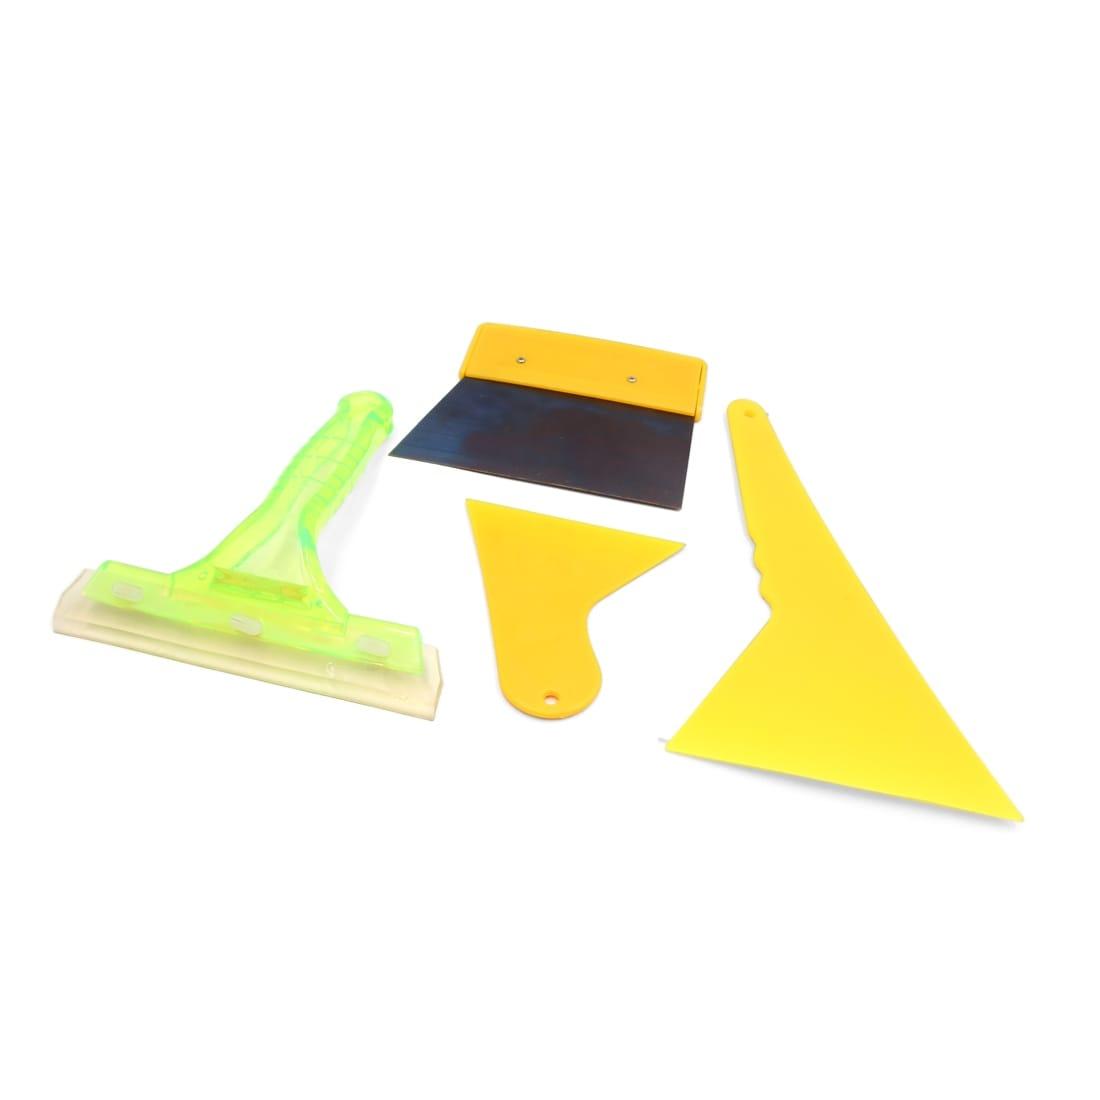 Window Tint Tools Tri-Edge Yellow 10 Pcs